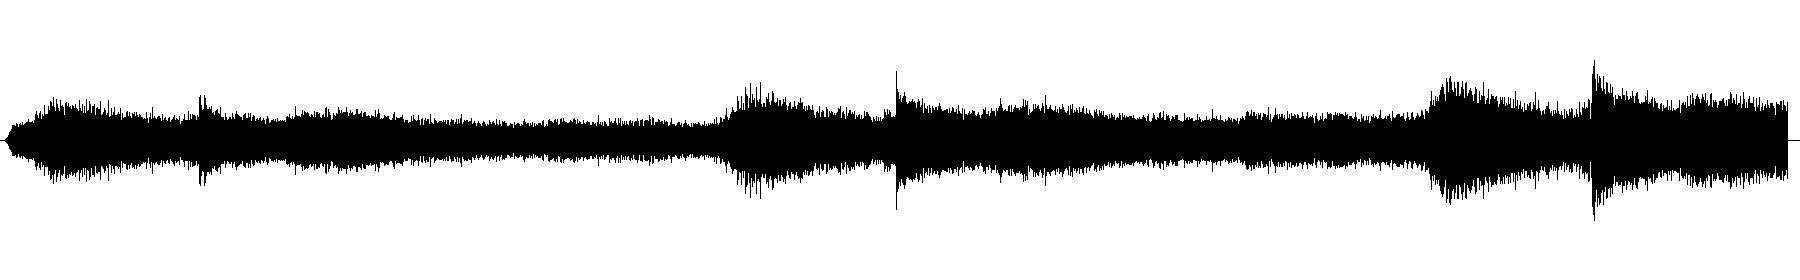 stm sample challenge timestrech 0.94x 1